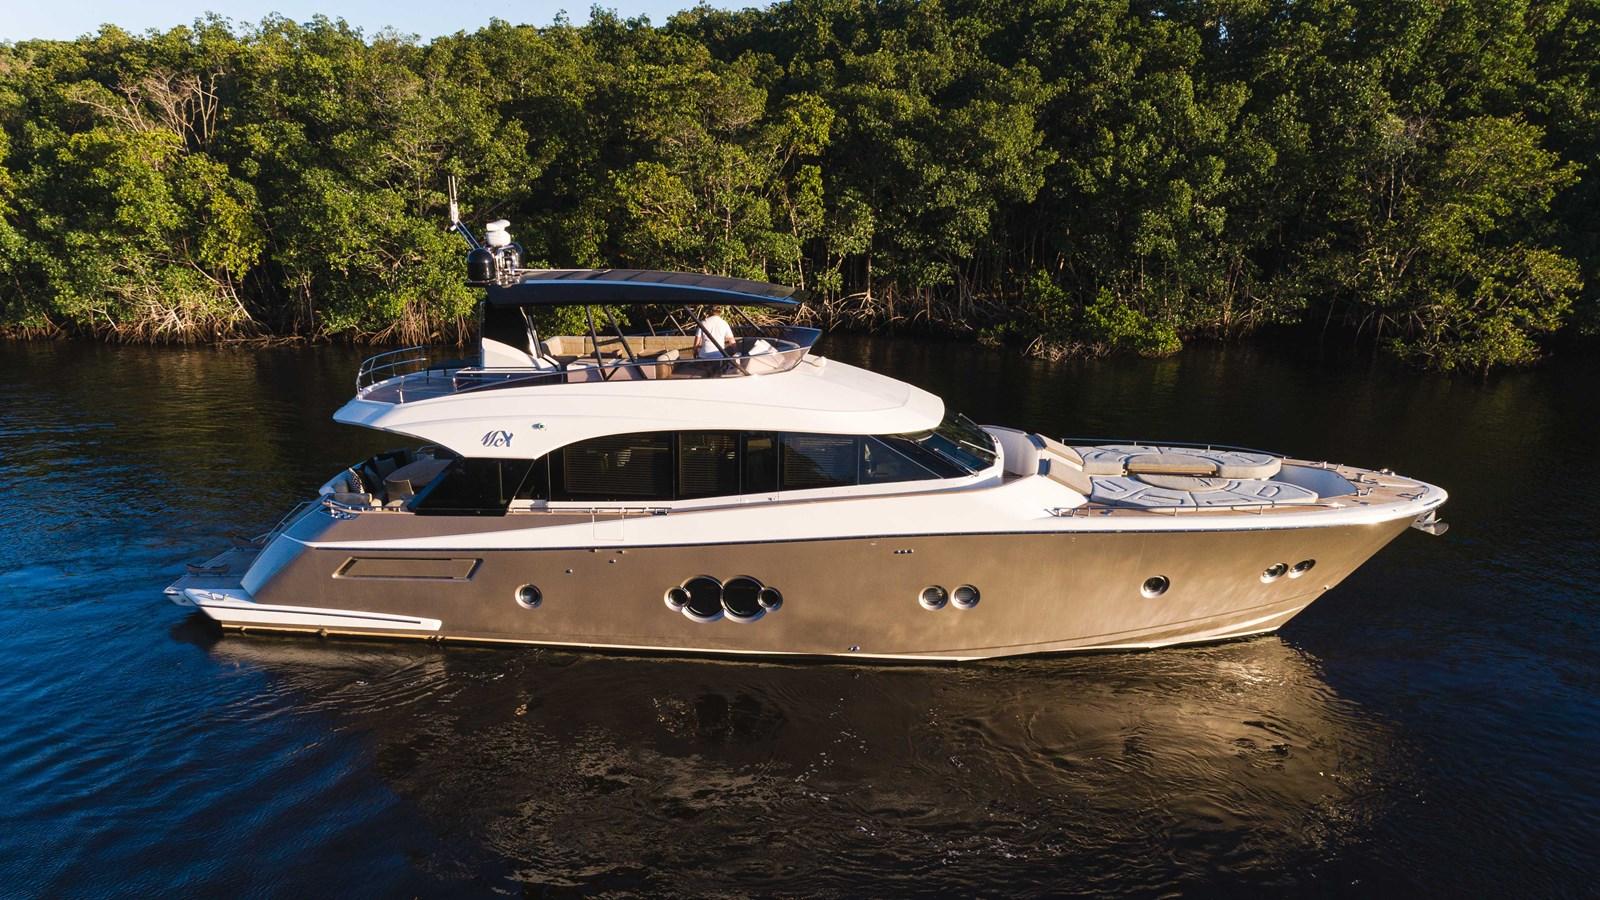 76 Monte Carlo (11 of 127) 2014 MONTE CARLO YACHTS Motoryacht Motor Yacht 2824964